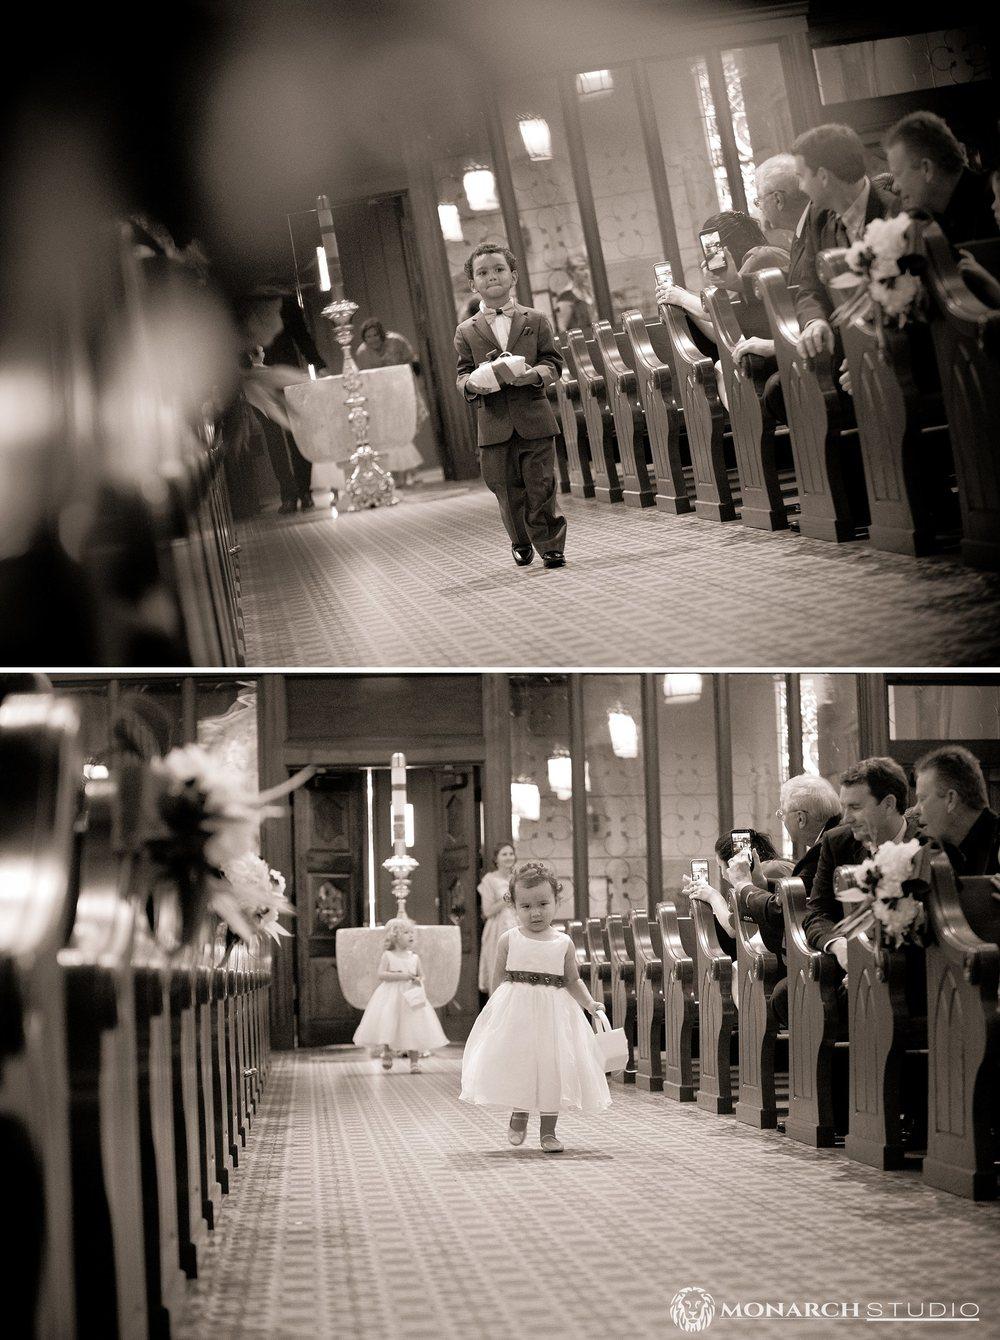 Treasury-on-The-Plaza-Wedding-Reception_0010.jpg